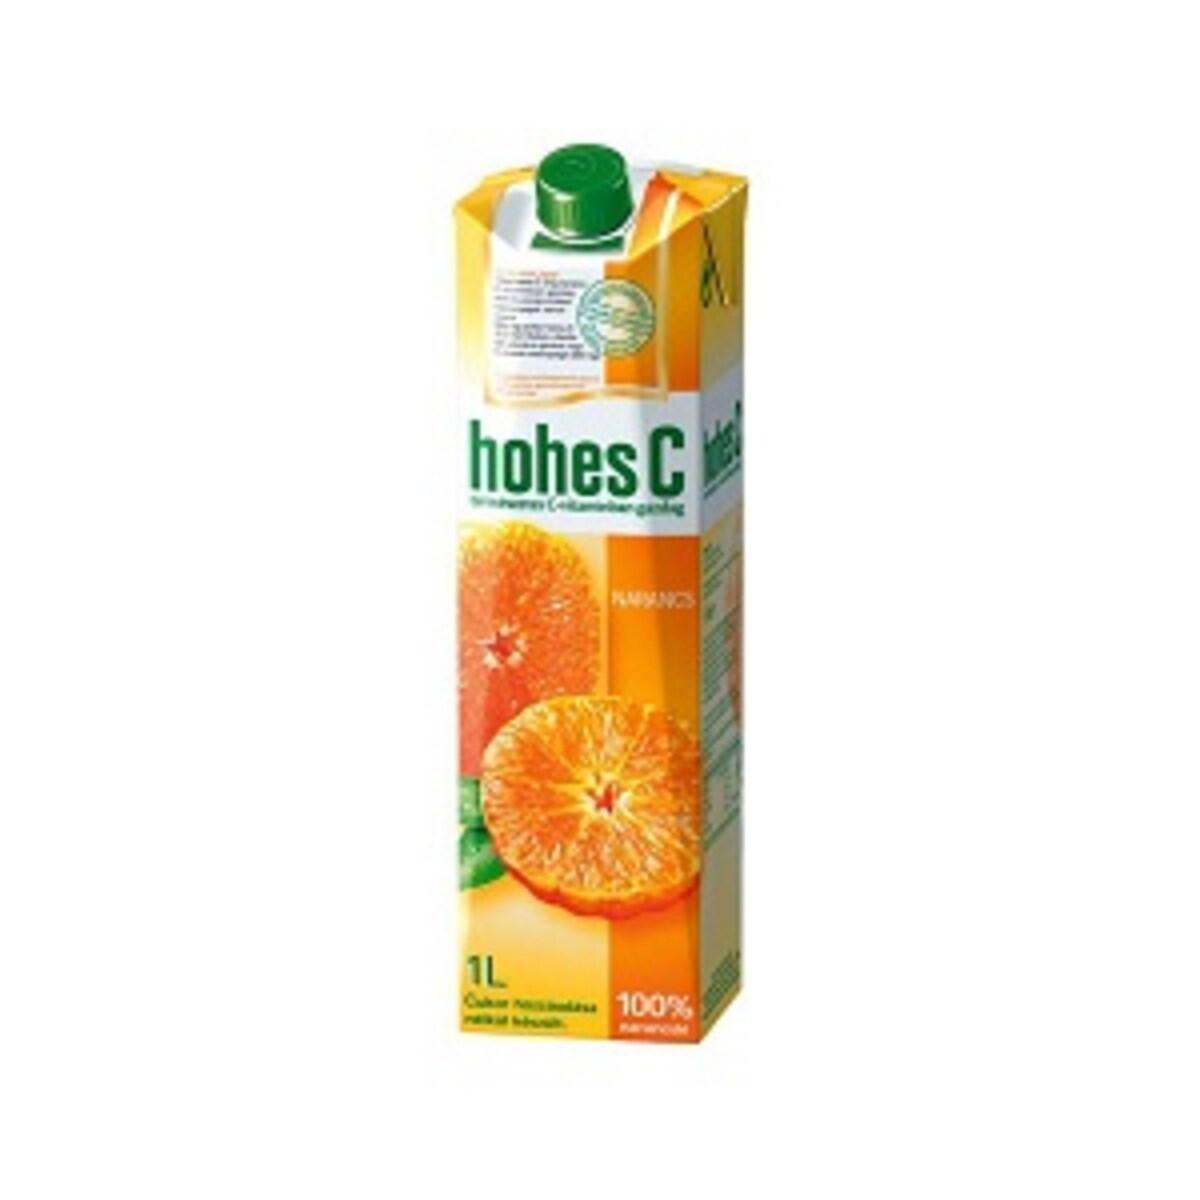 Hohes C Портокал стандарт 100% сок 1л